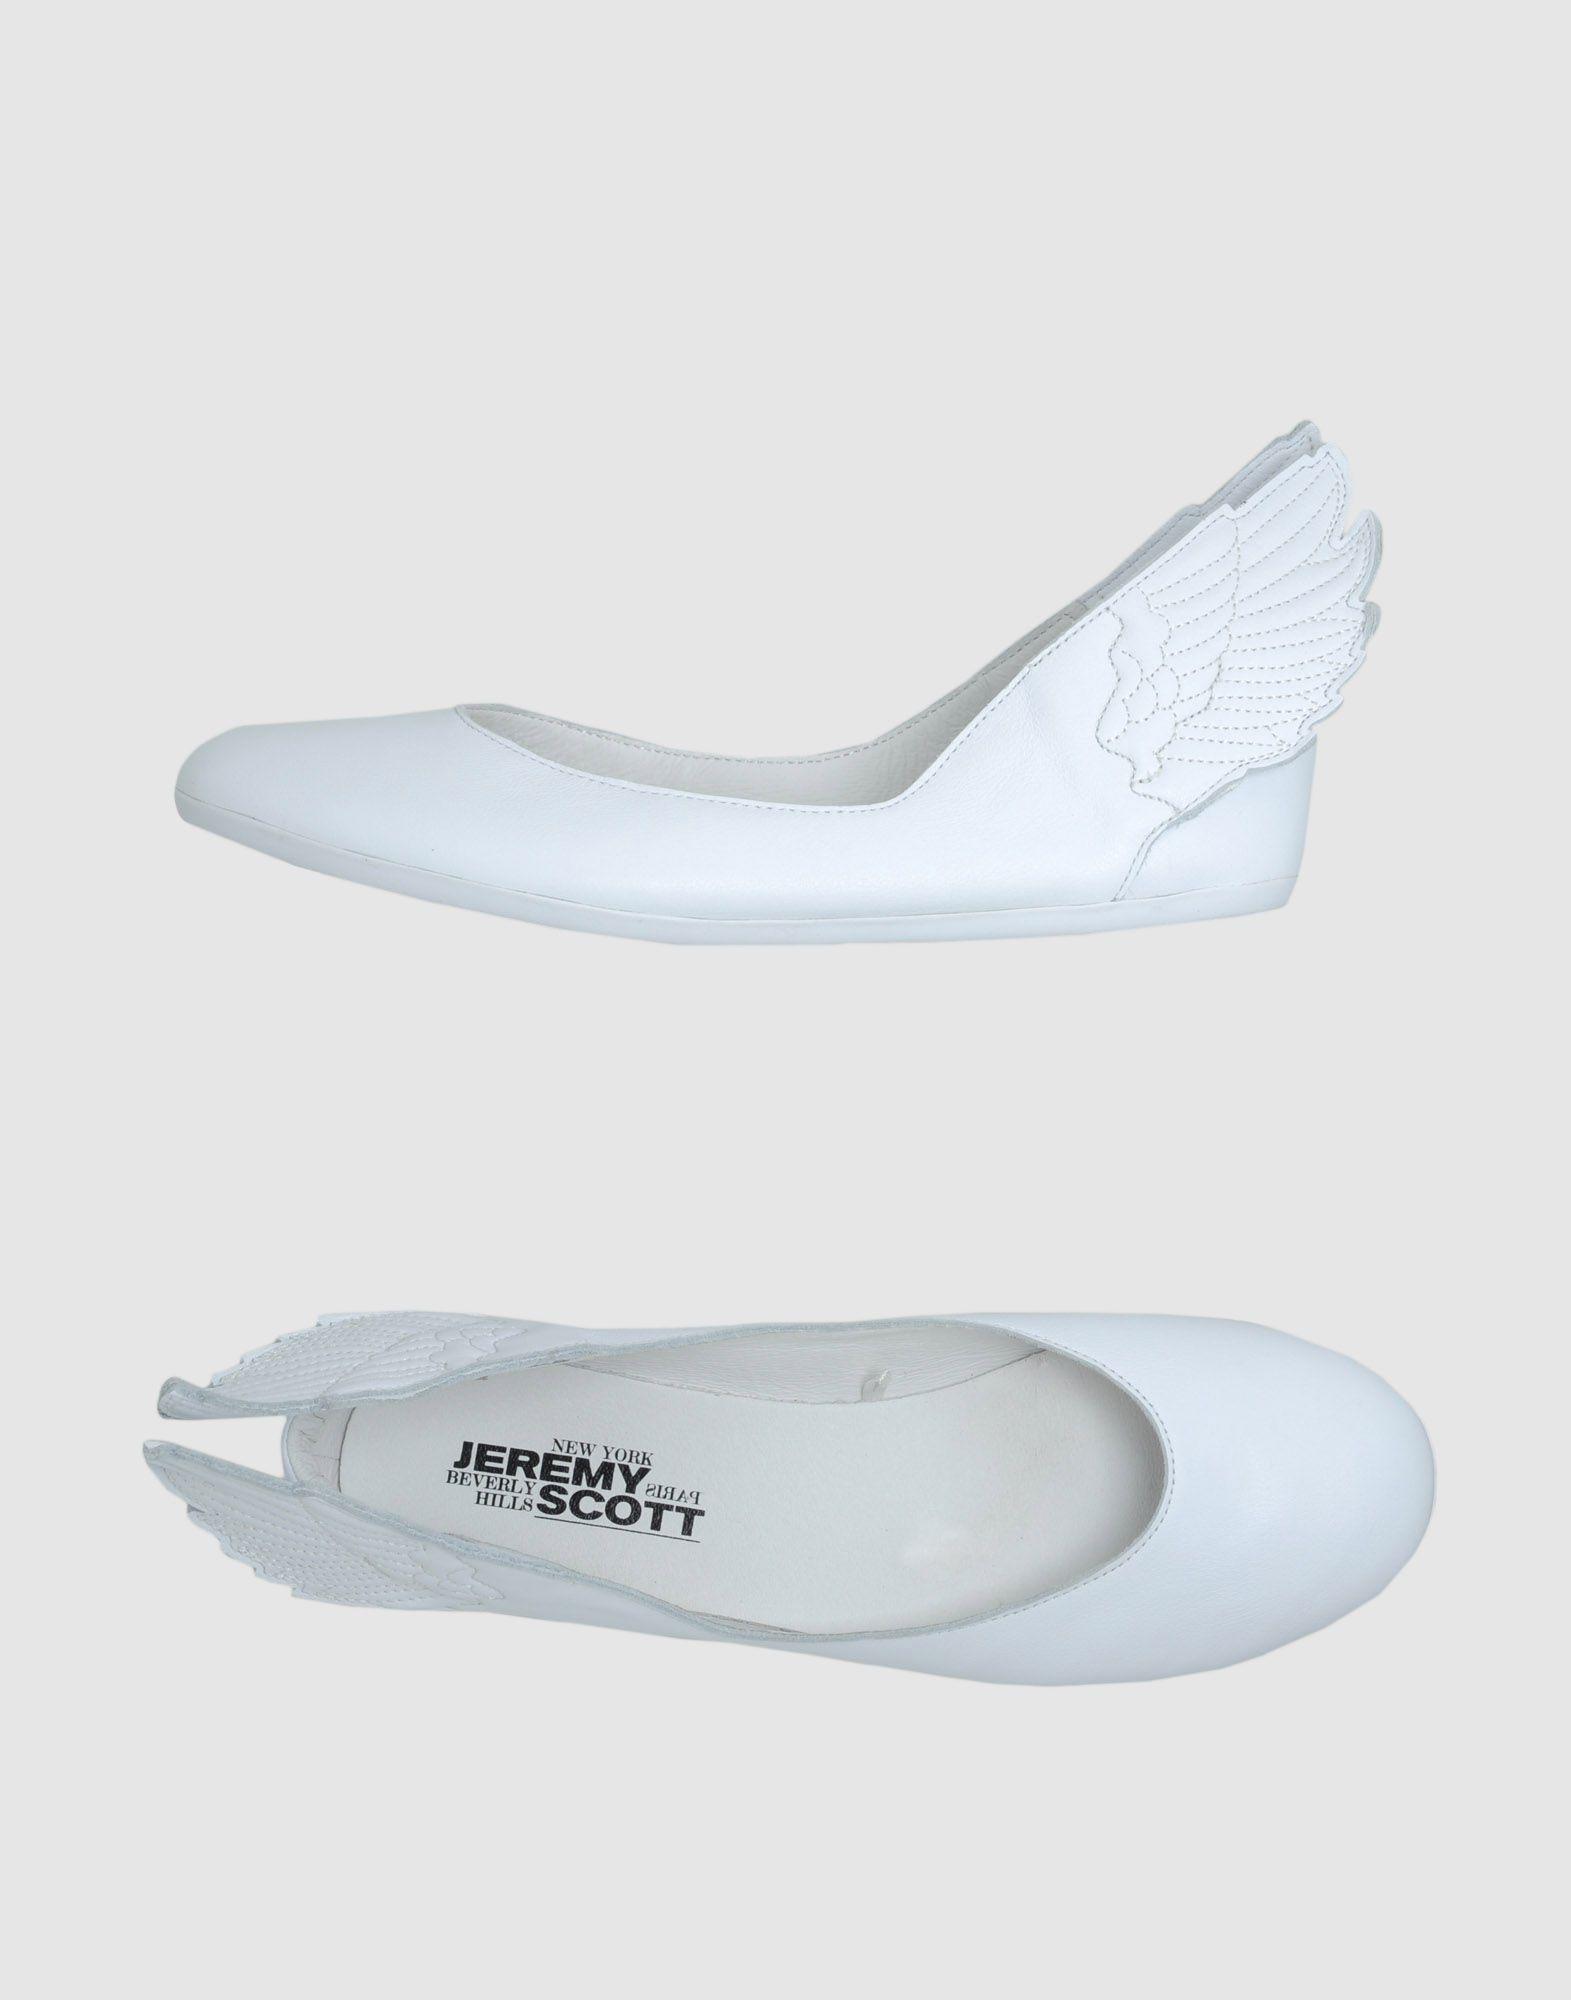 jeremy scott scott adidas adidas | | 1439913 - itorrent.site